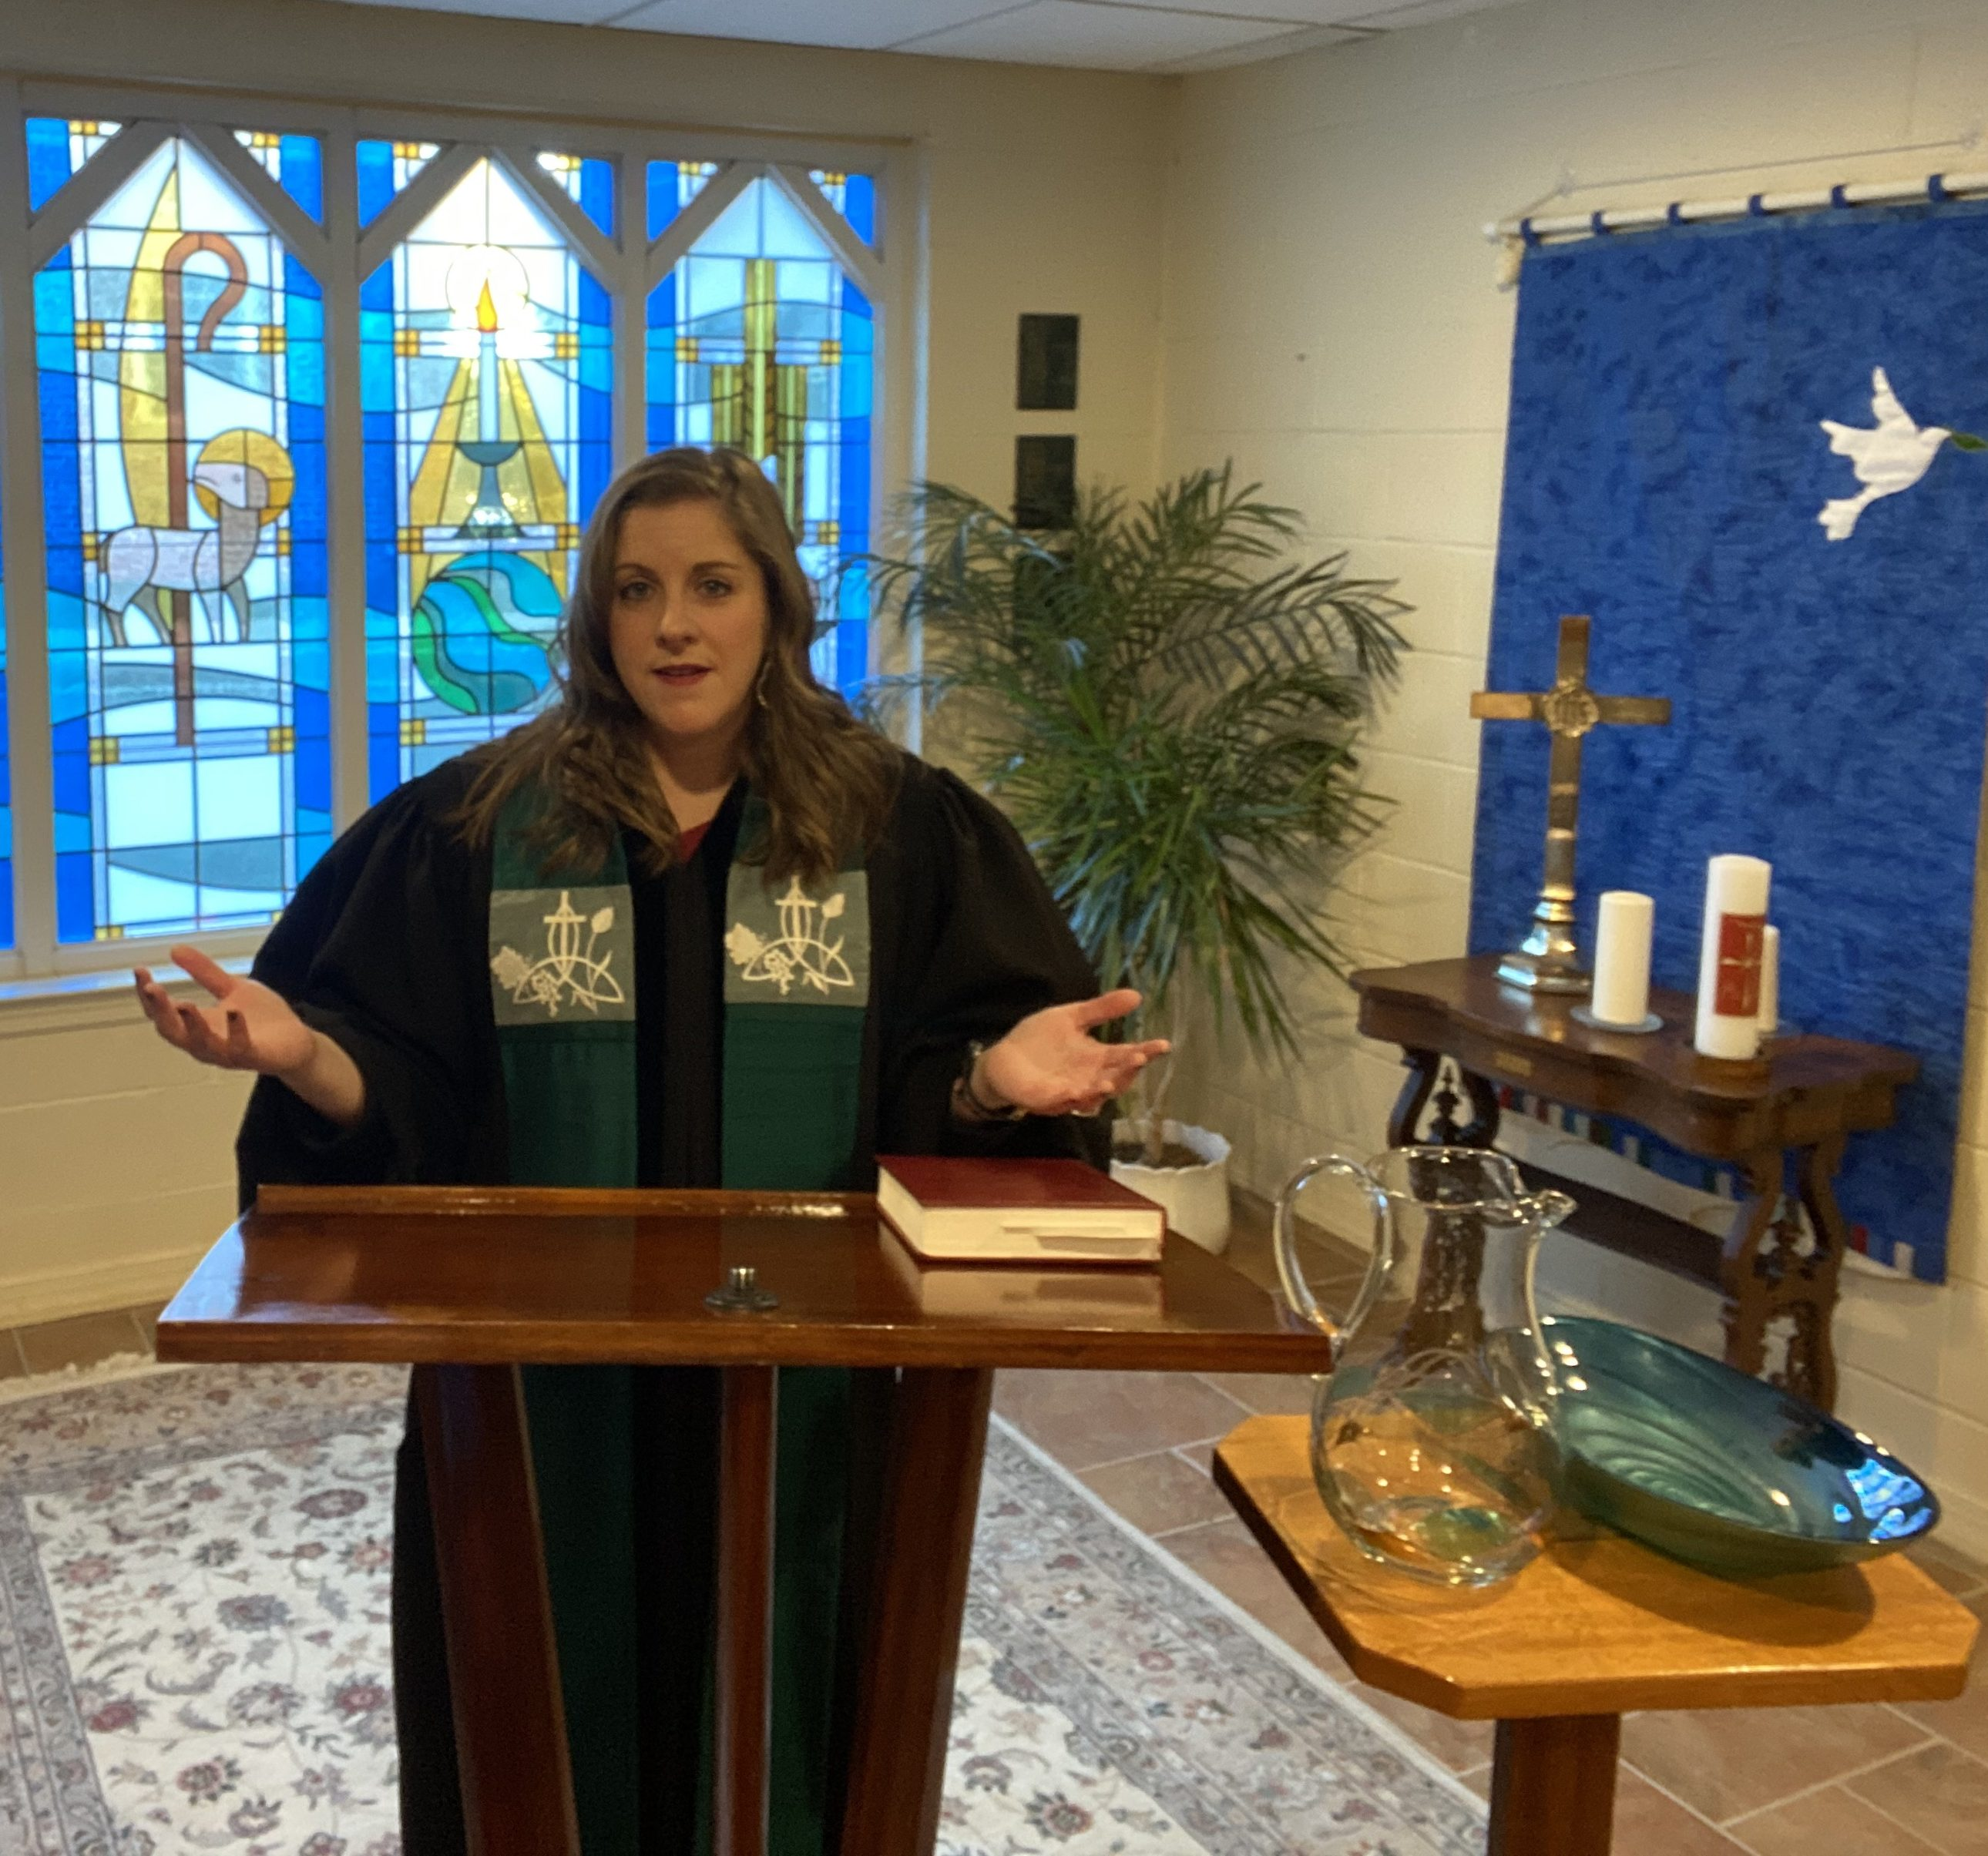 Pastor Melissa preaching